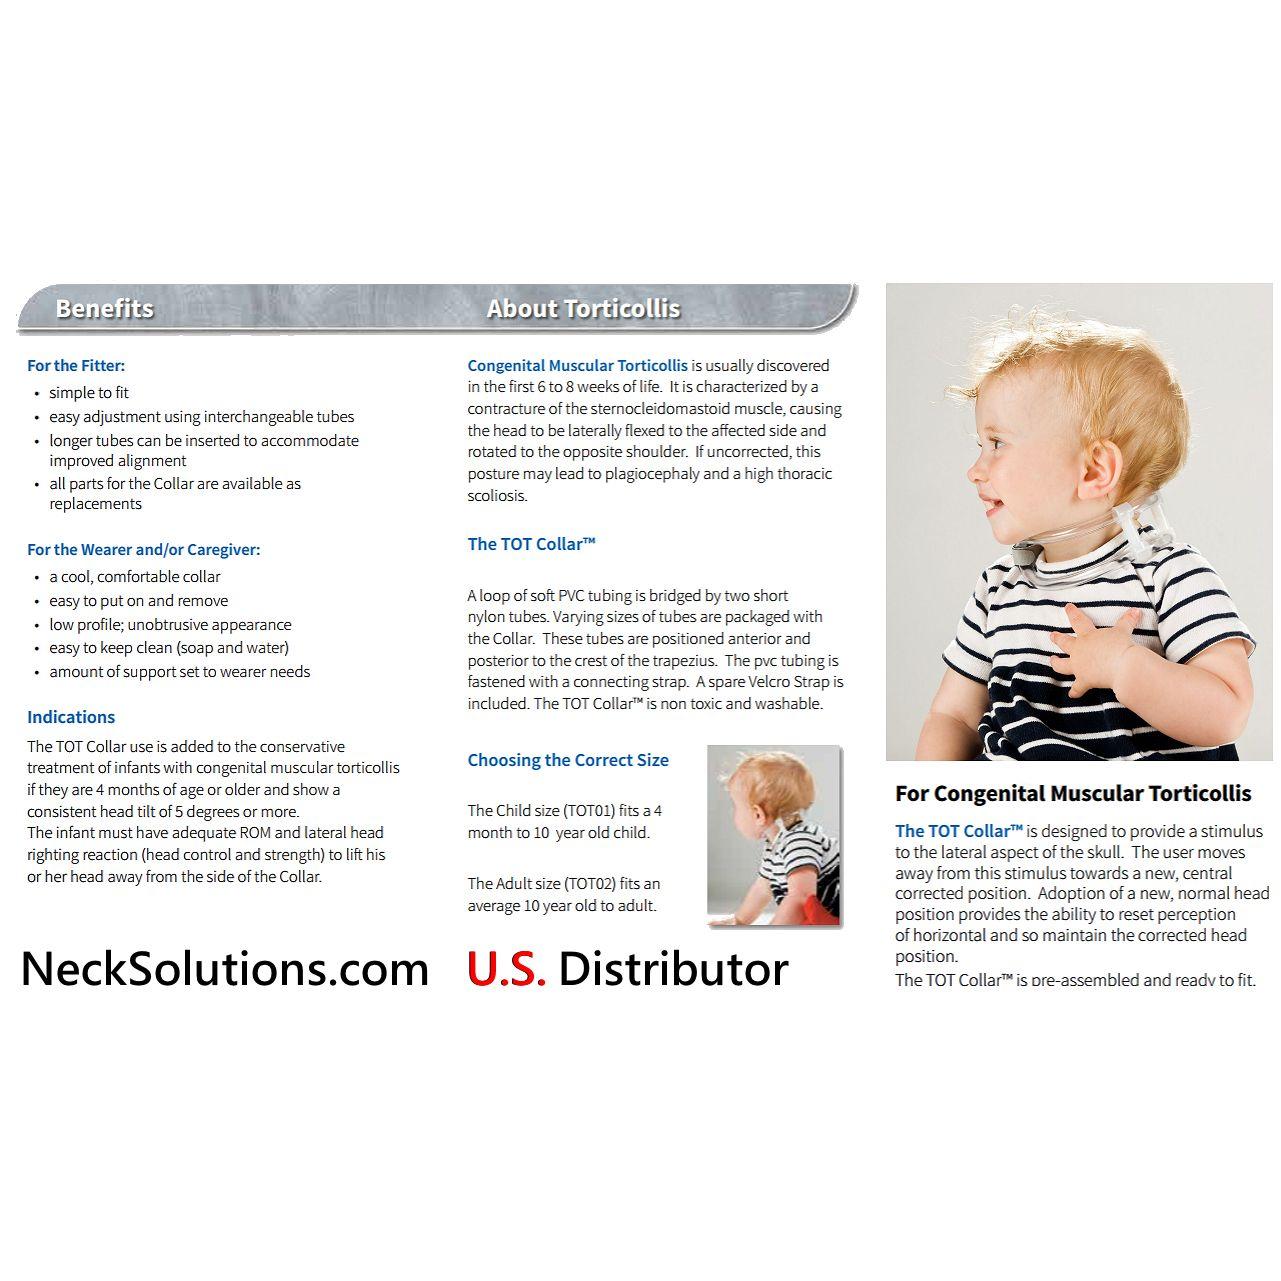 e1bd7ae4d821 Tot Collar - Torticollis Treatment For Infants